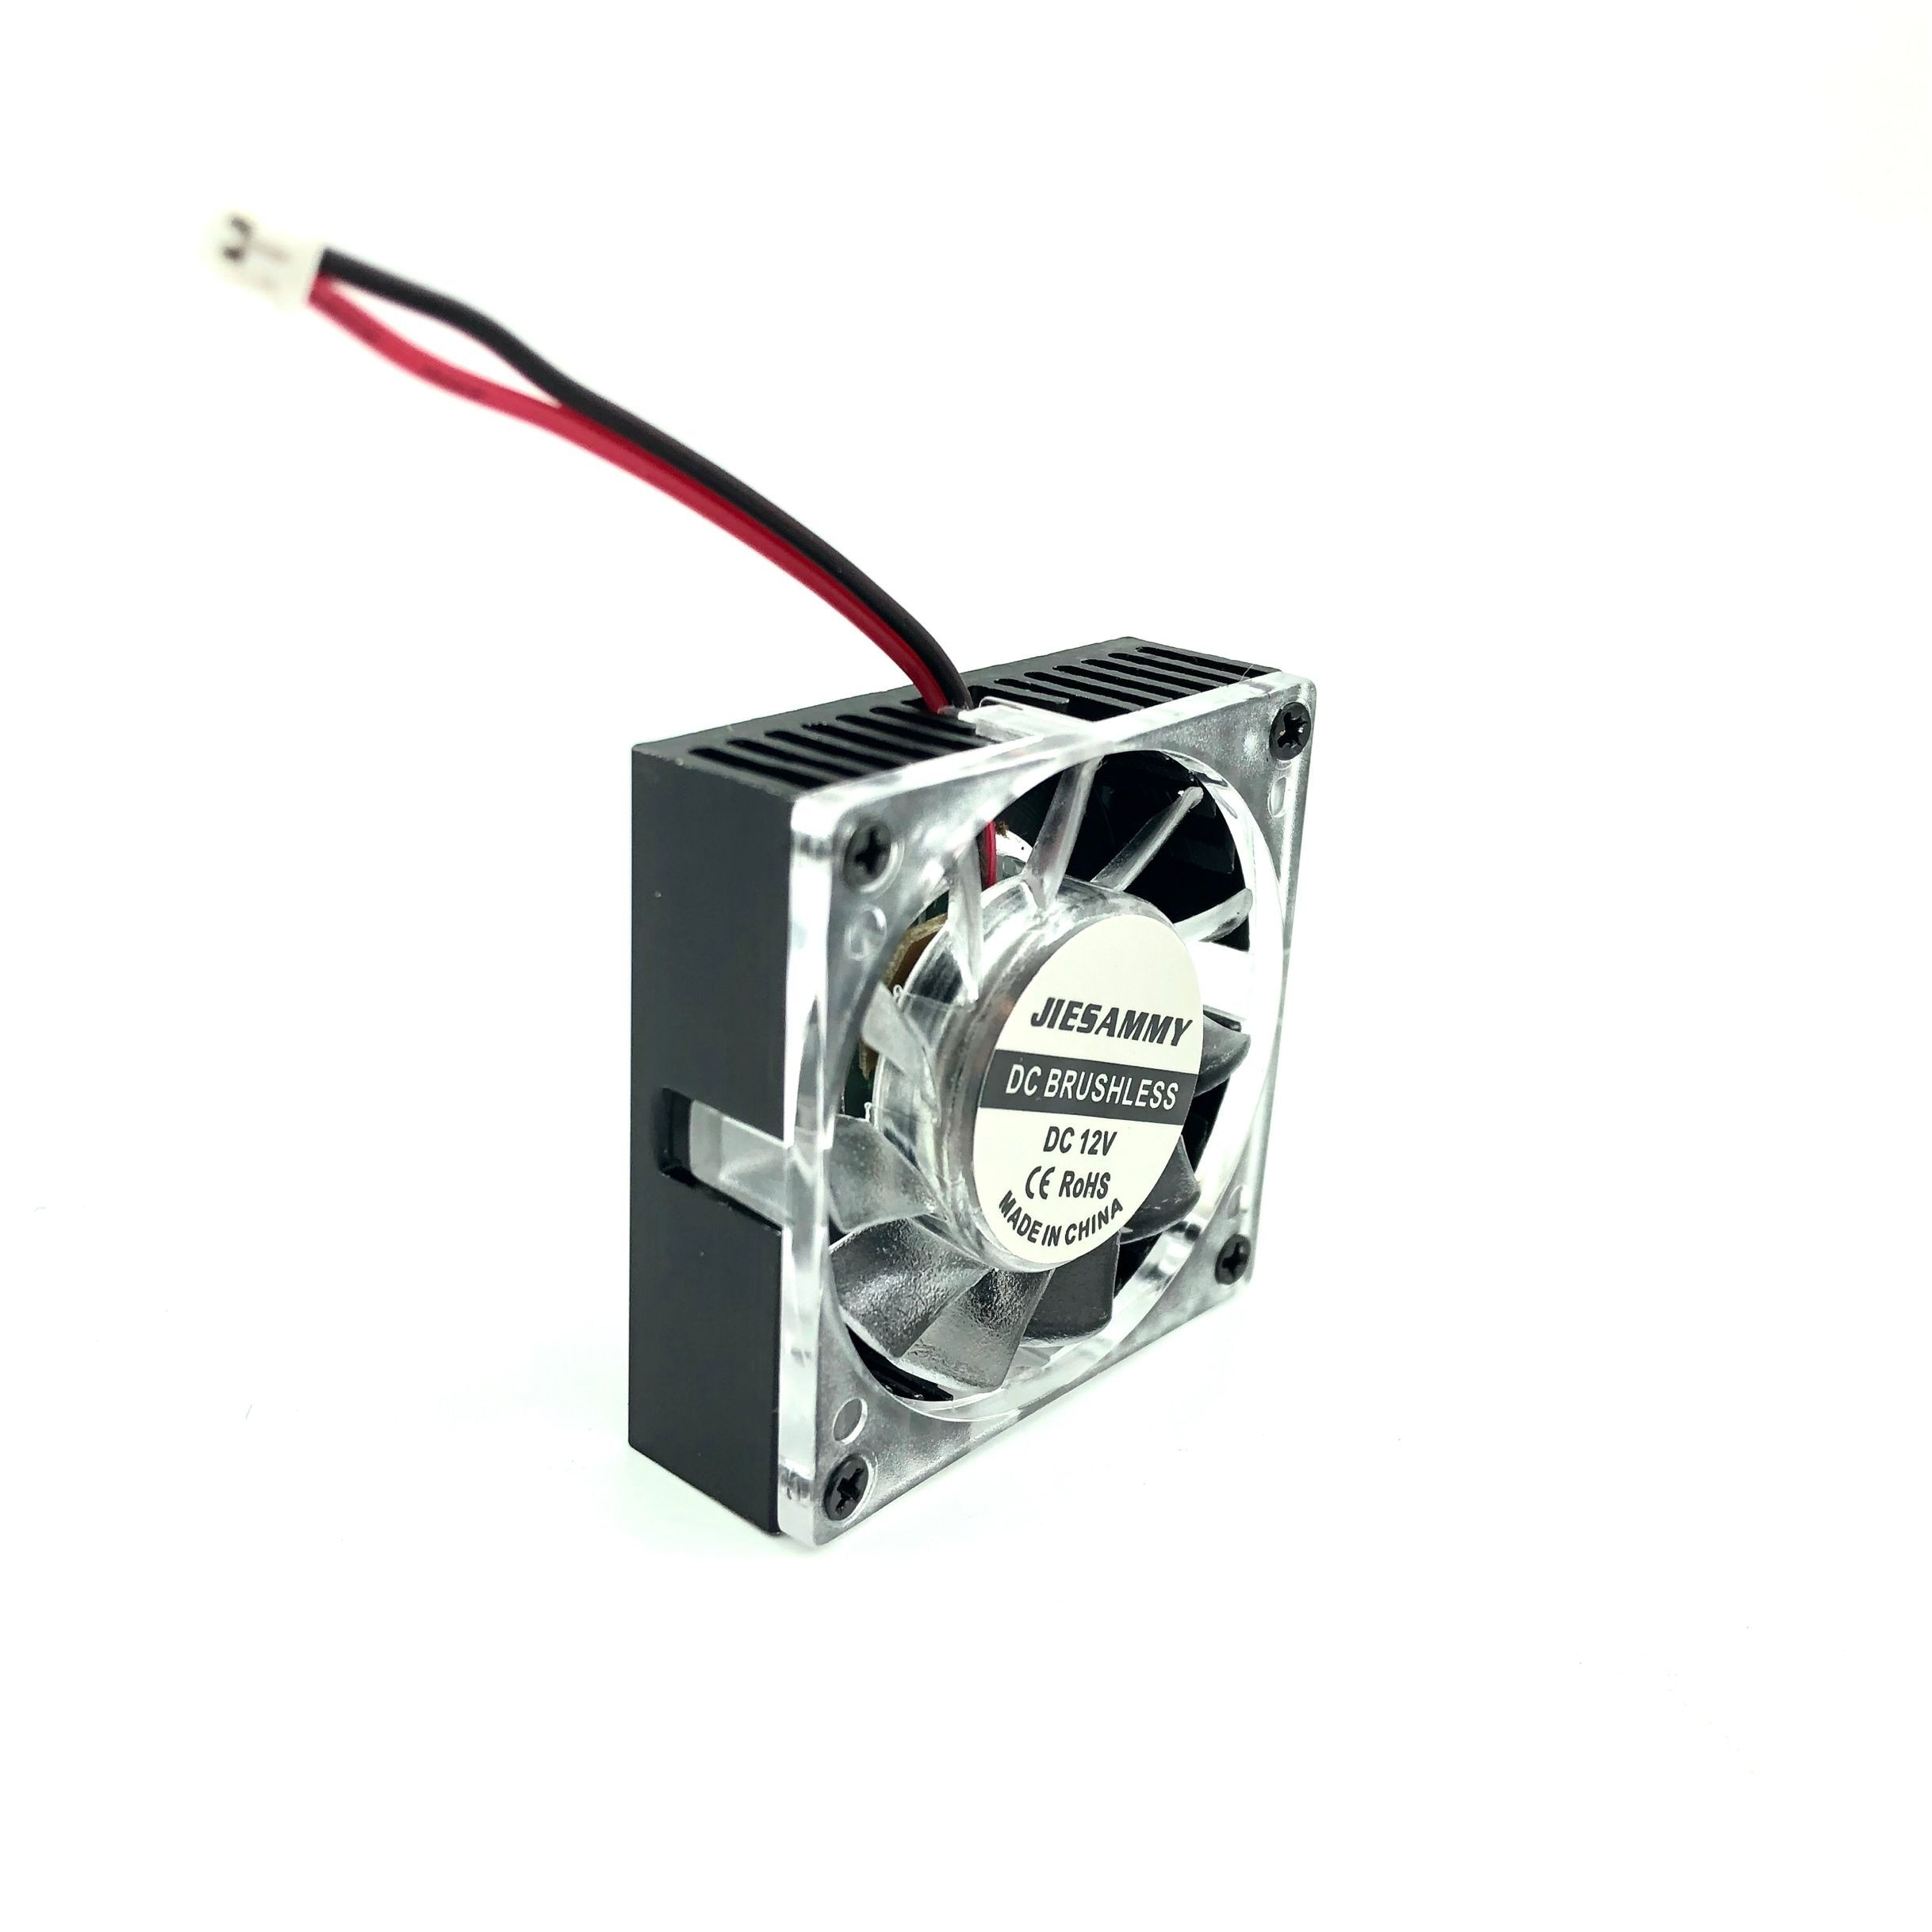 40mm heatsink 4010 5V Aluminum CPU Card Cooling Cooler 40x40x10 BGA fan Graphics Card Heat sink Cooling Fan